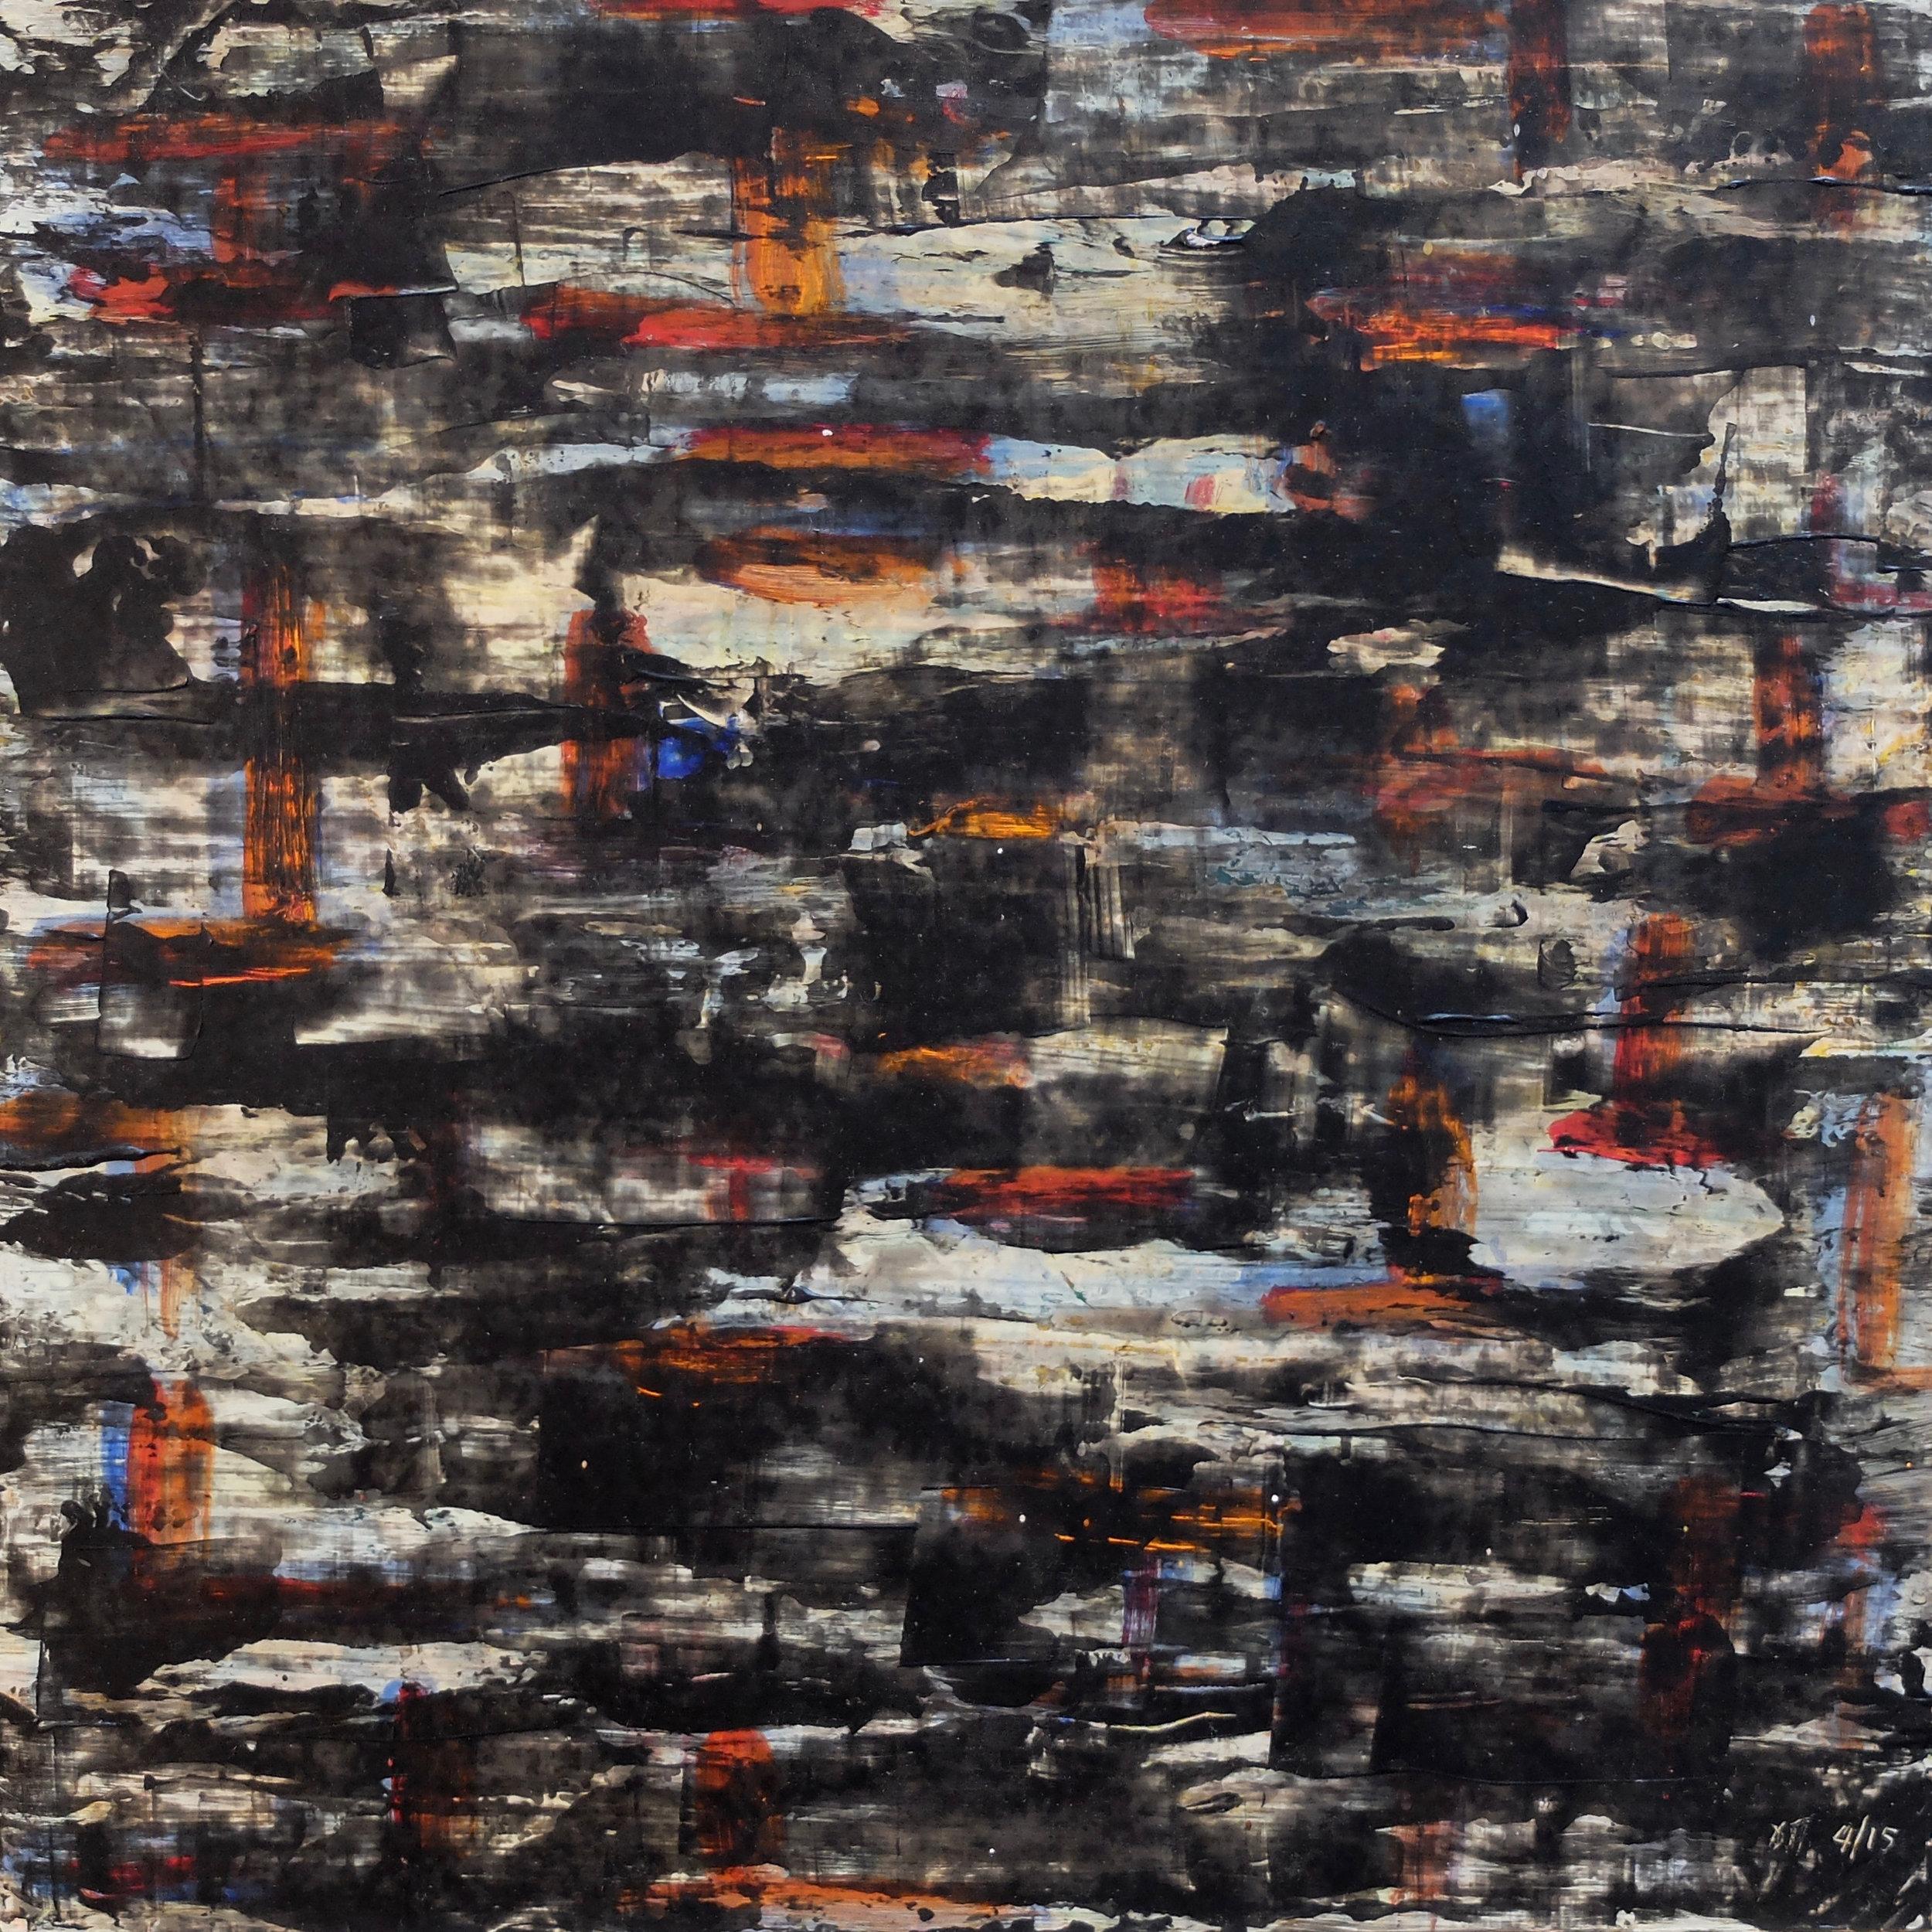 untitled; mixed media on MDF; 40x40; 2015